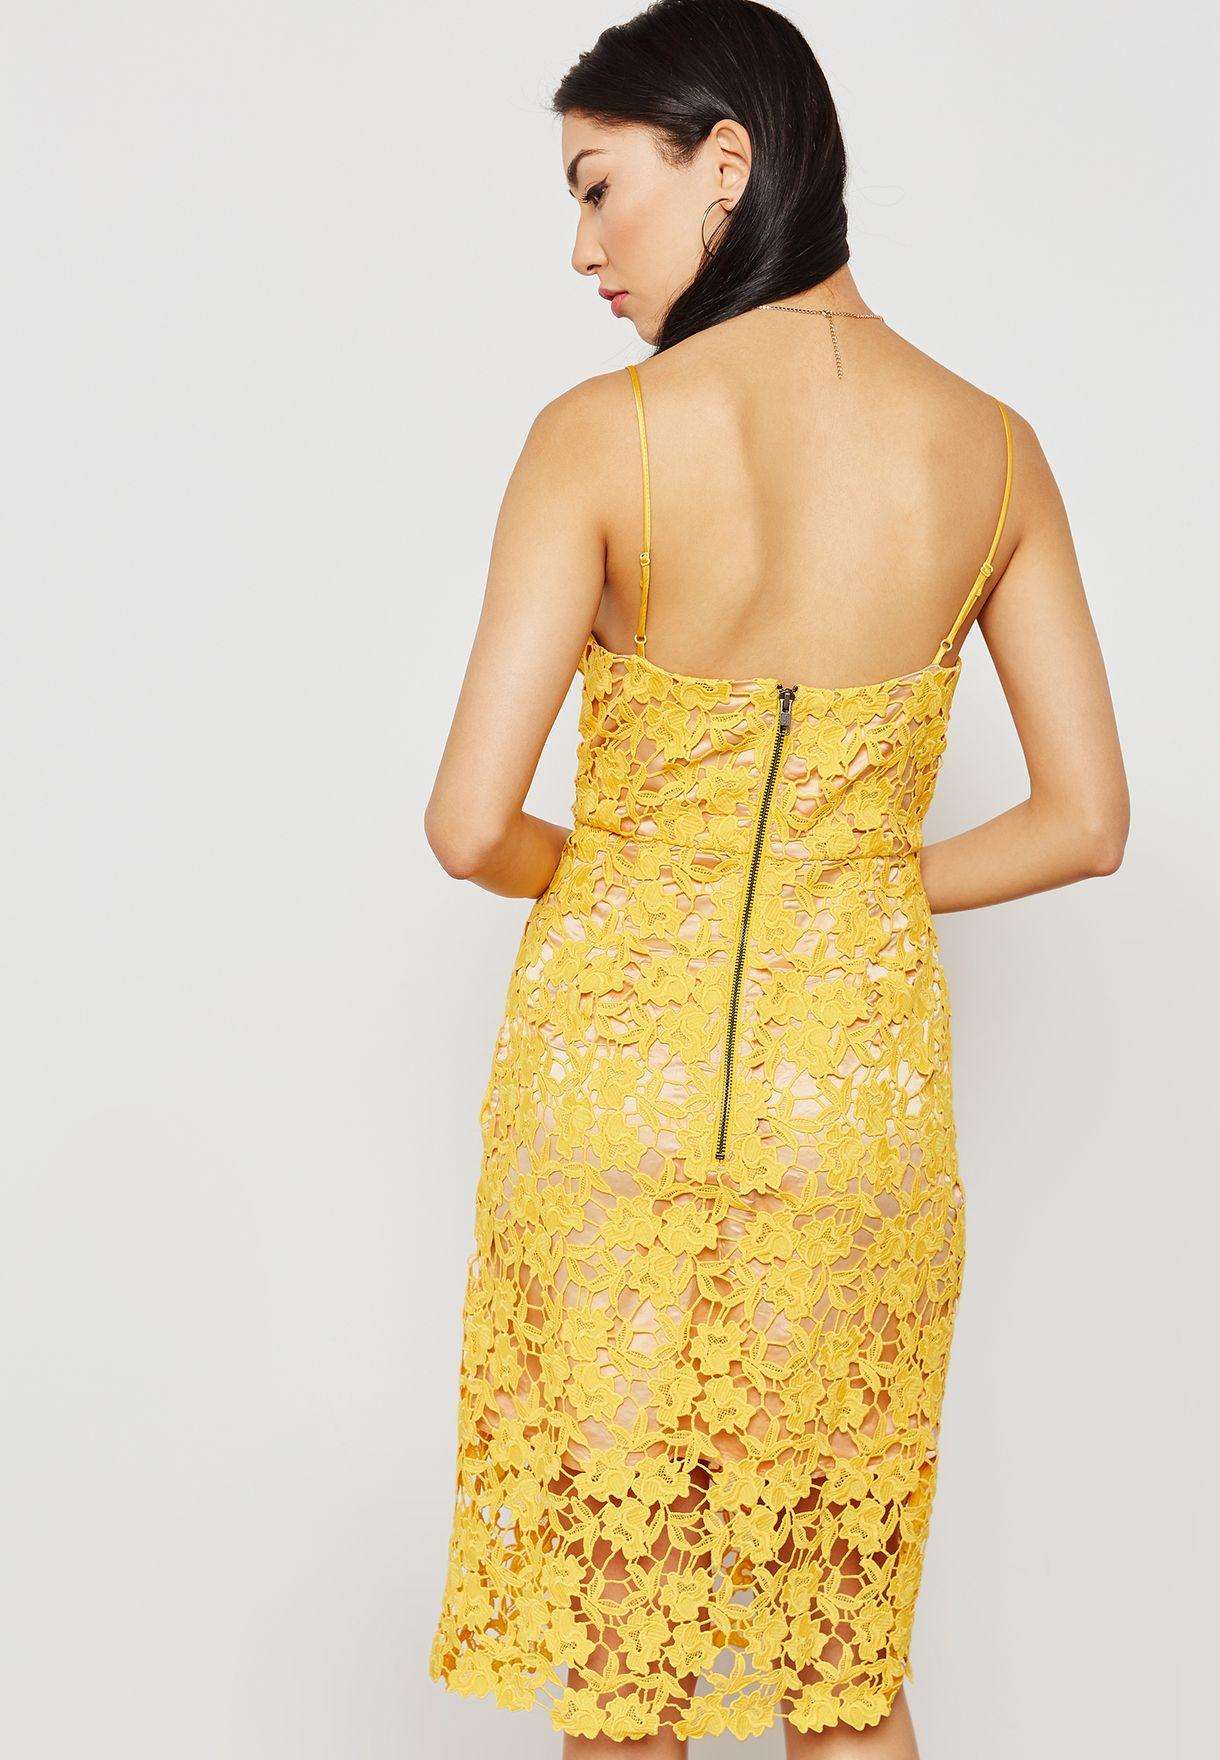 فستان دانتيل بحمالات كتف رفيعة